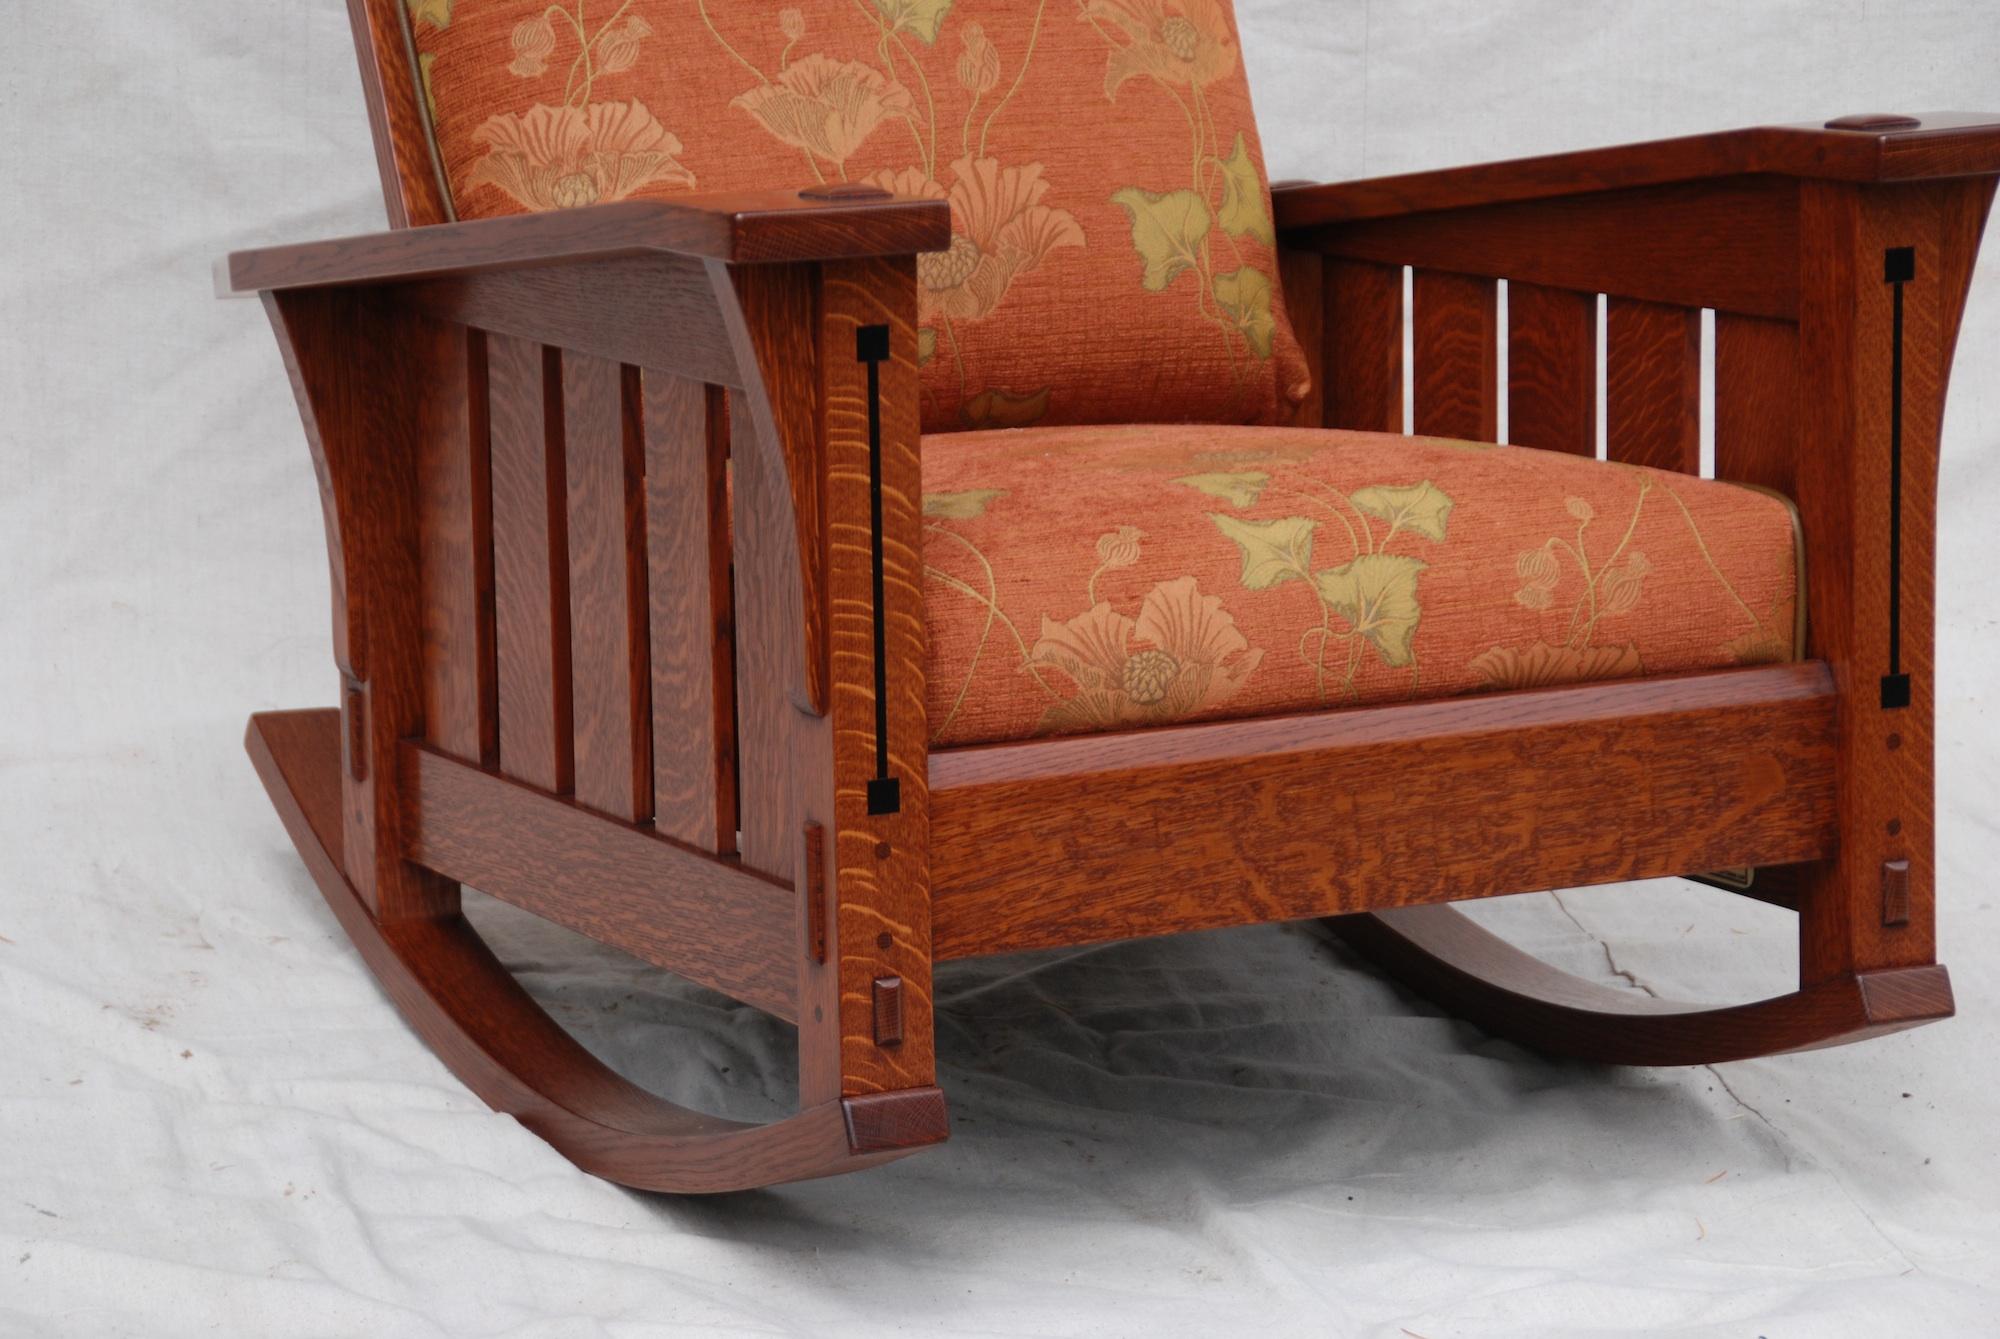 Rocking chairs morris chairs antique mission oak rocking chair - Furniture Slant Arm Gustav Stickley Inspired Morris Rocking Chair Luxury Stickley Rocking Chair